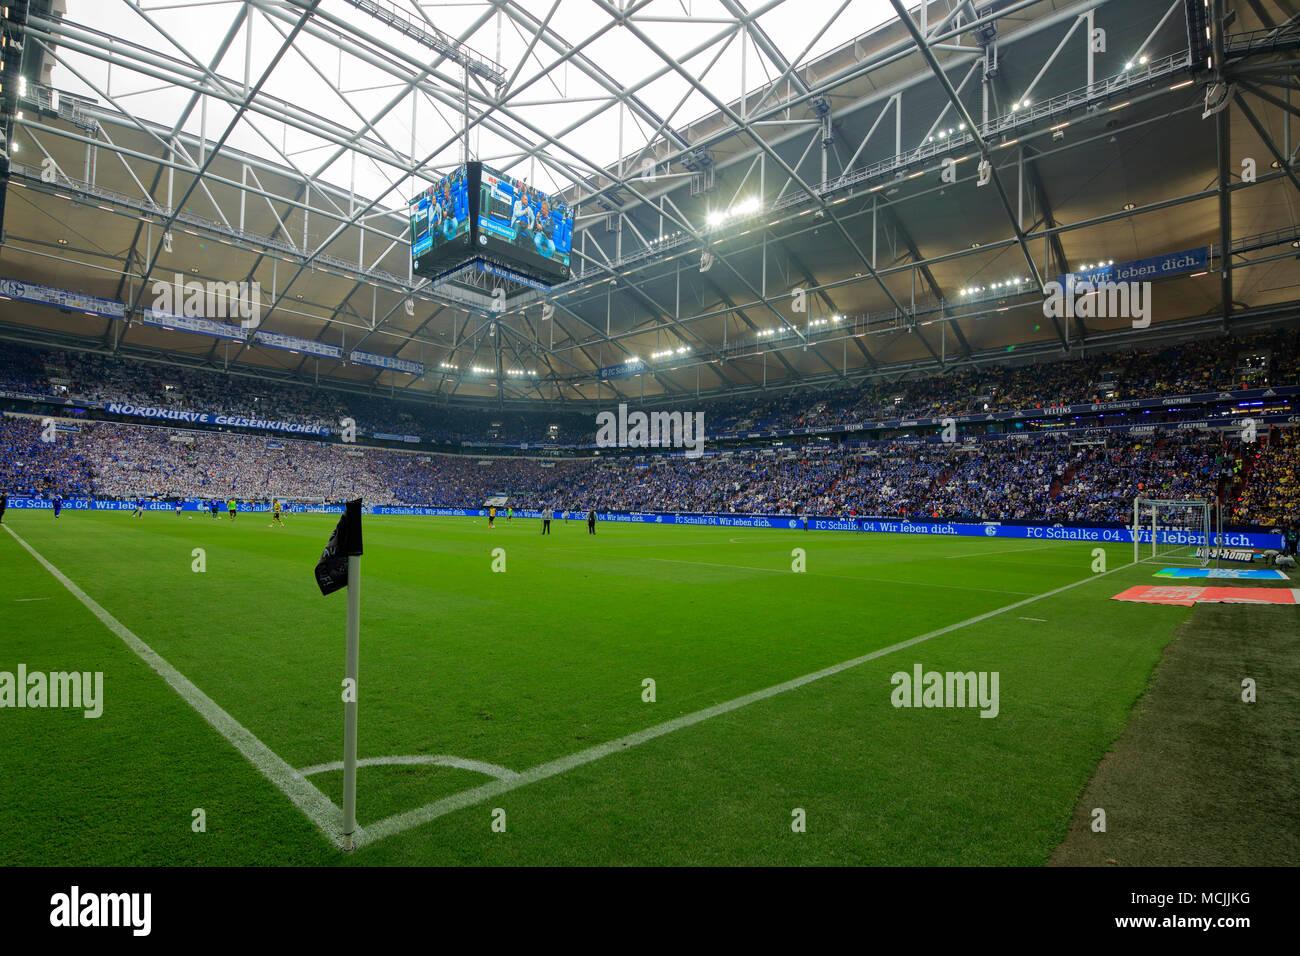 sports, football, Bundesliga, 2017/2018, FC Schalke 04 vs BVB Borussia Dortmund 2:0, Veltins Arena Gelsenkirchen, sports field, corner flag, stand, roof construction, opened roof - Stock Image